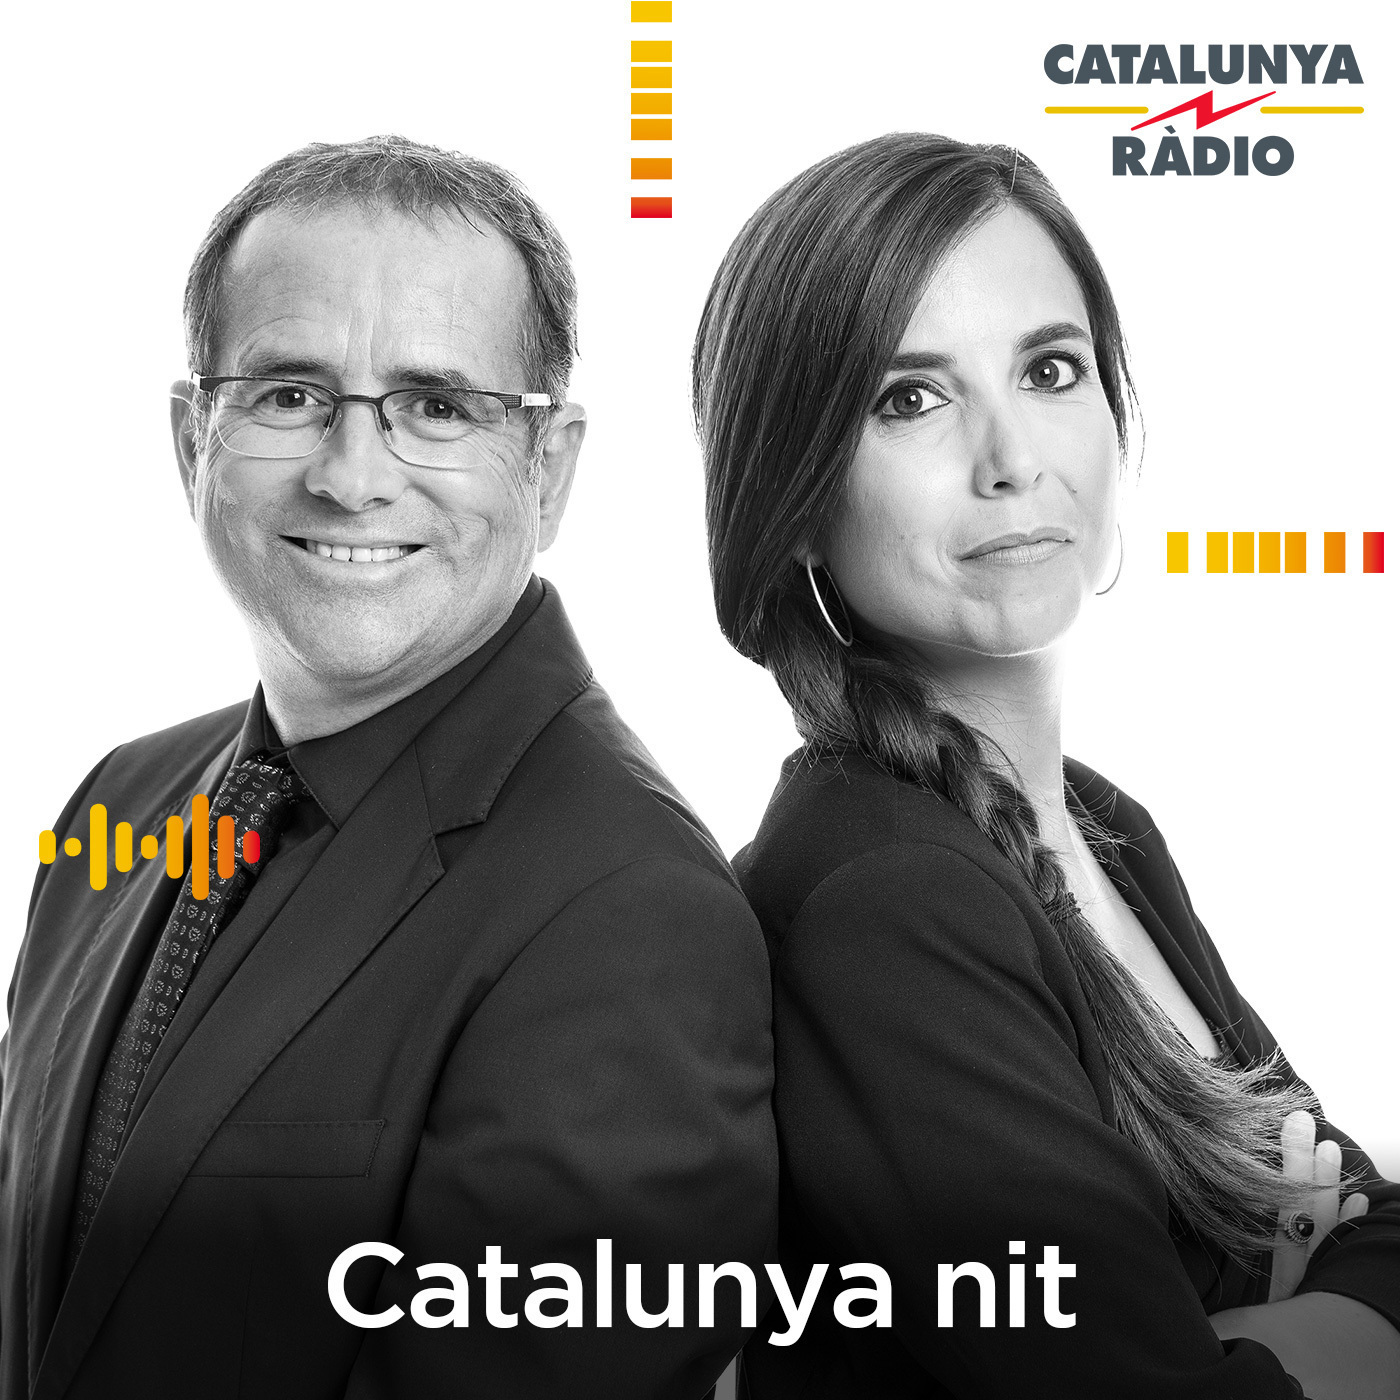 Catalunya nit